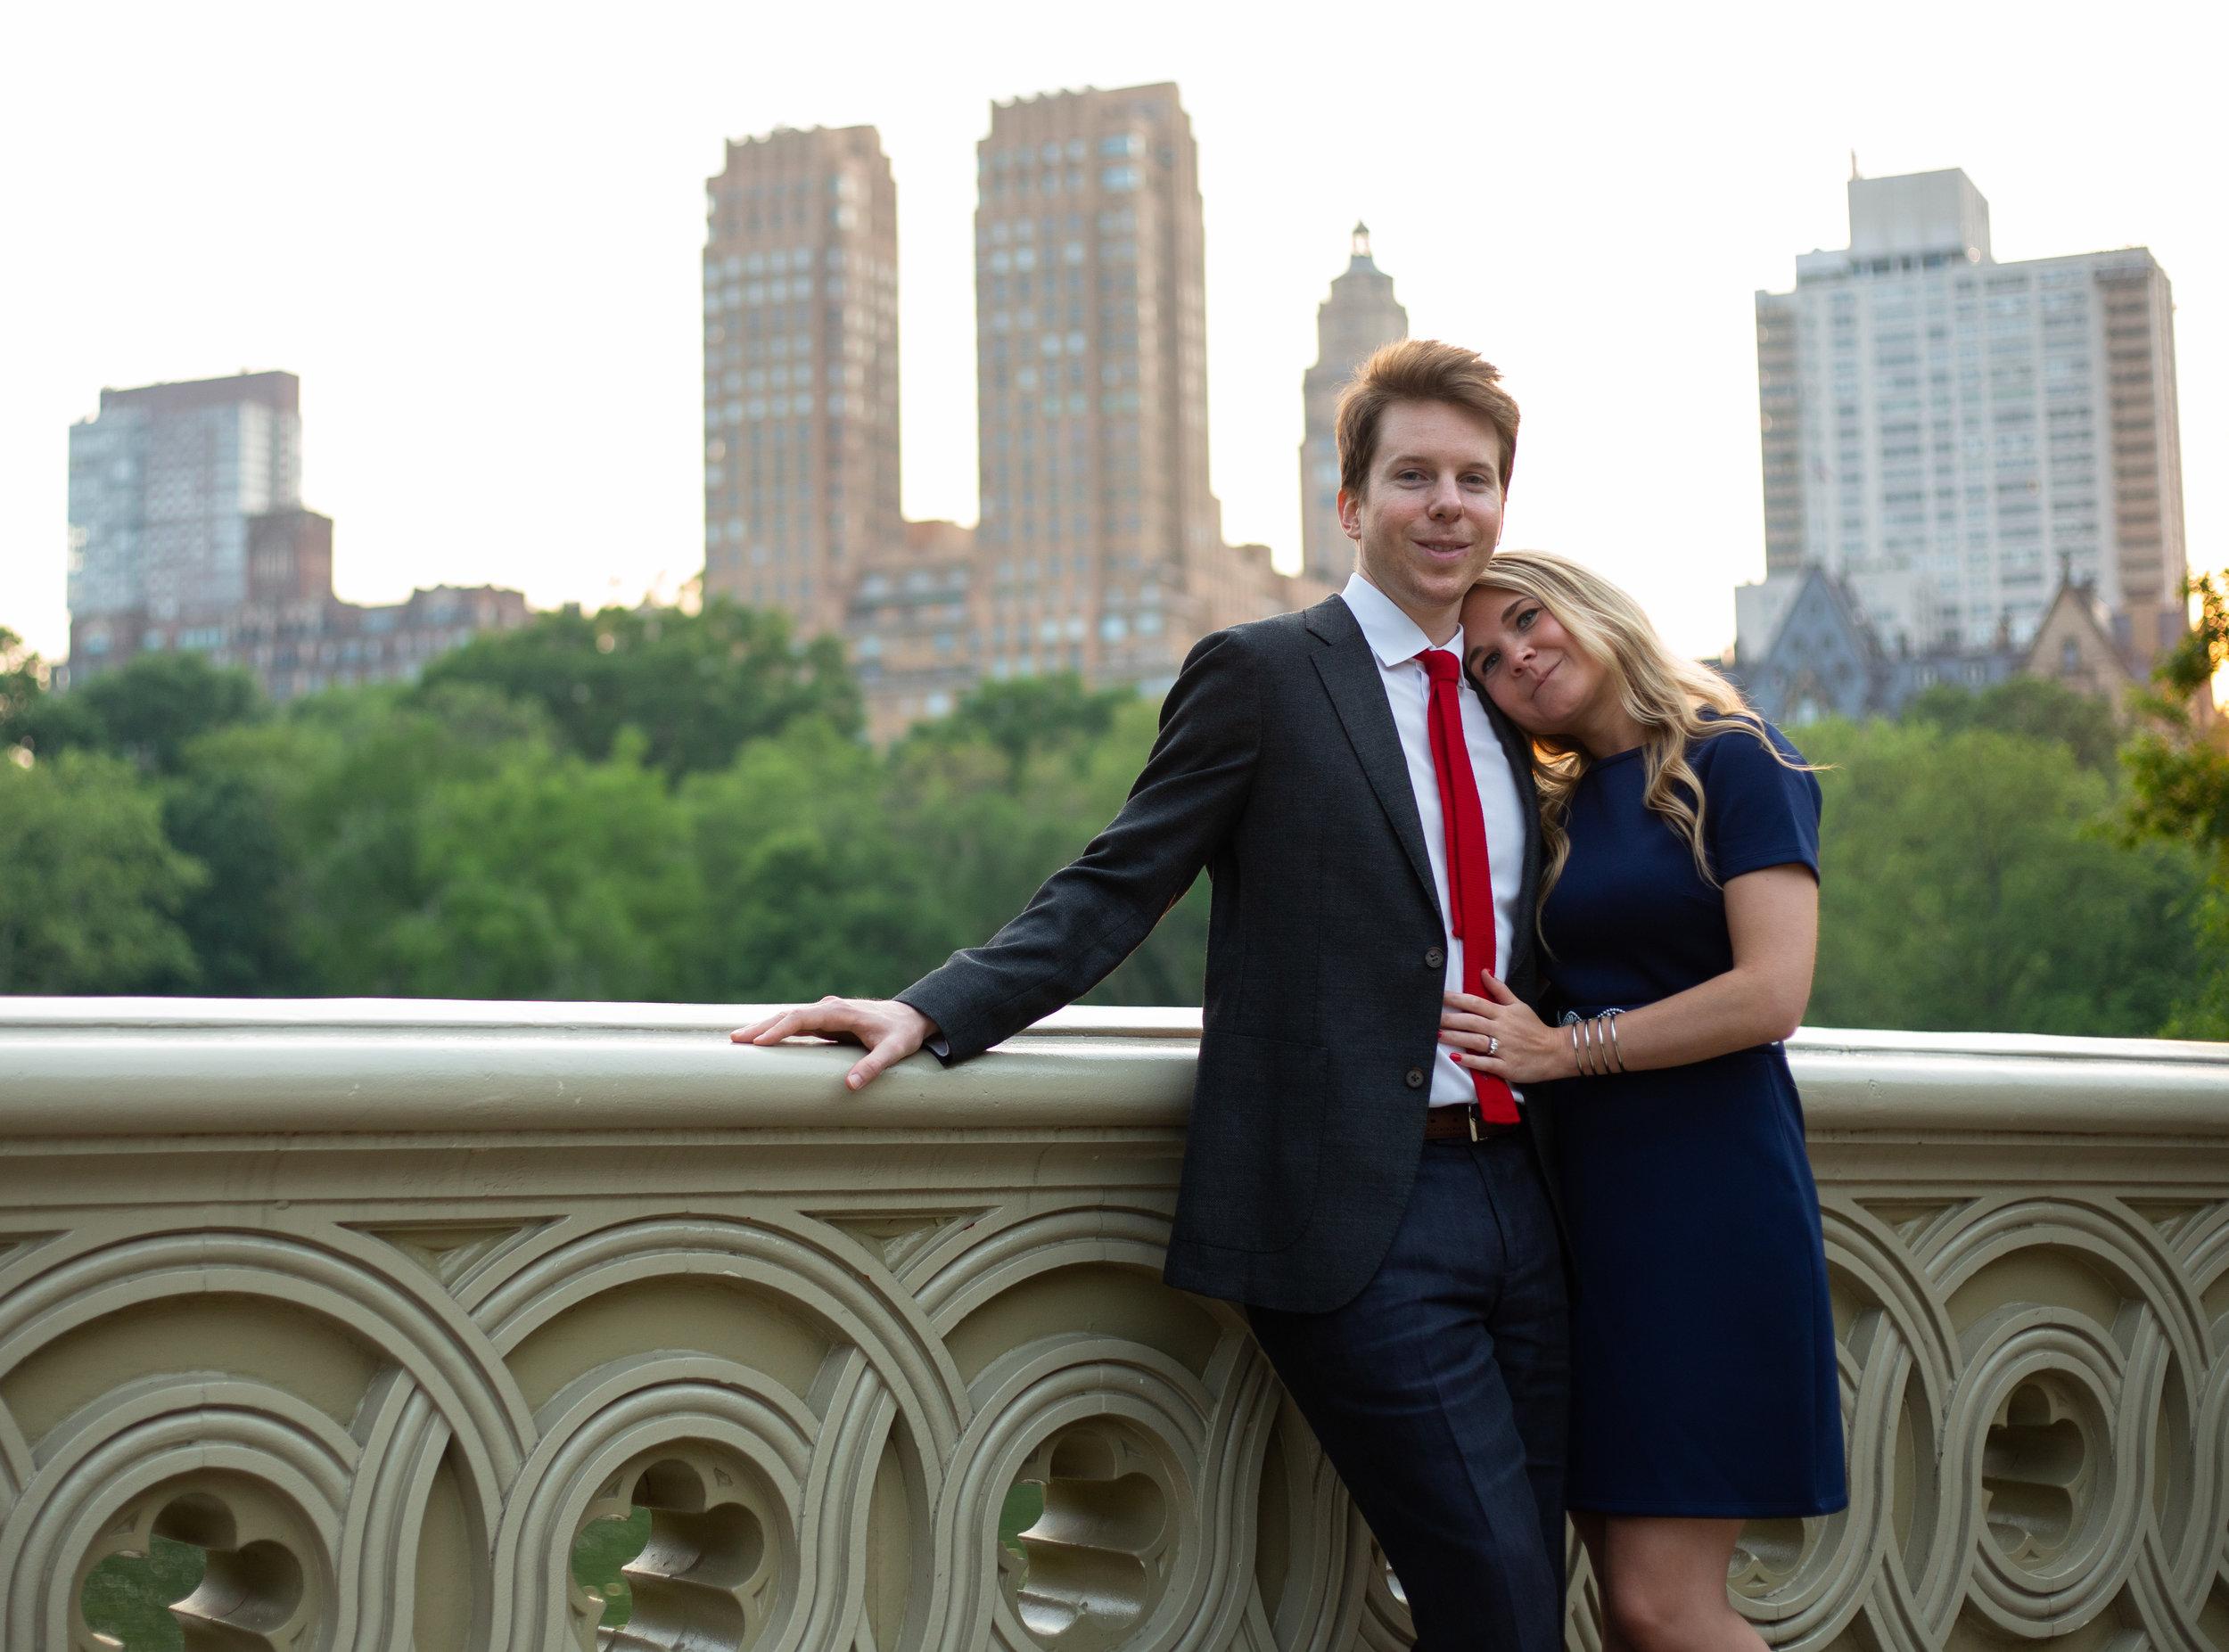 Gavin and Alex engagement shoot   Bow Bridge, Central Park   New York, New York   Canon 5DmkIII